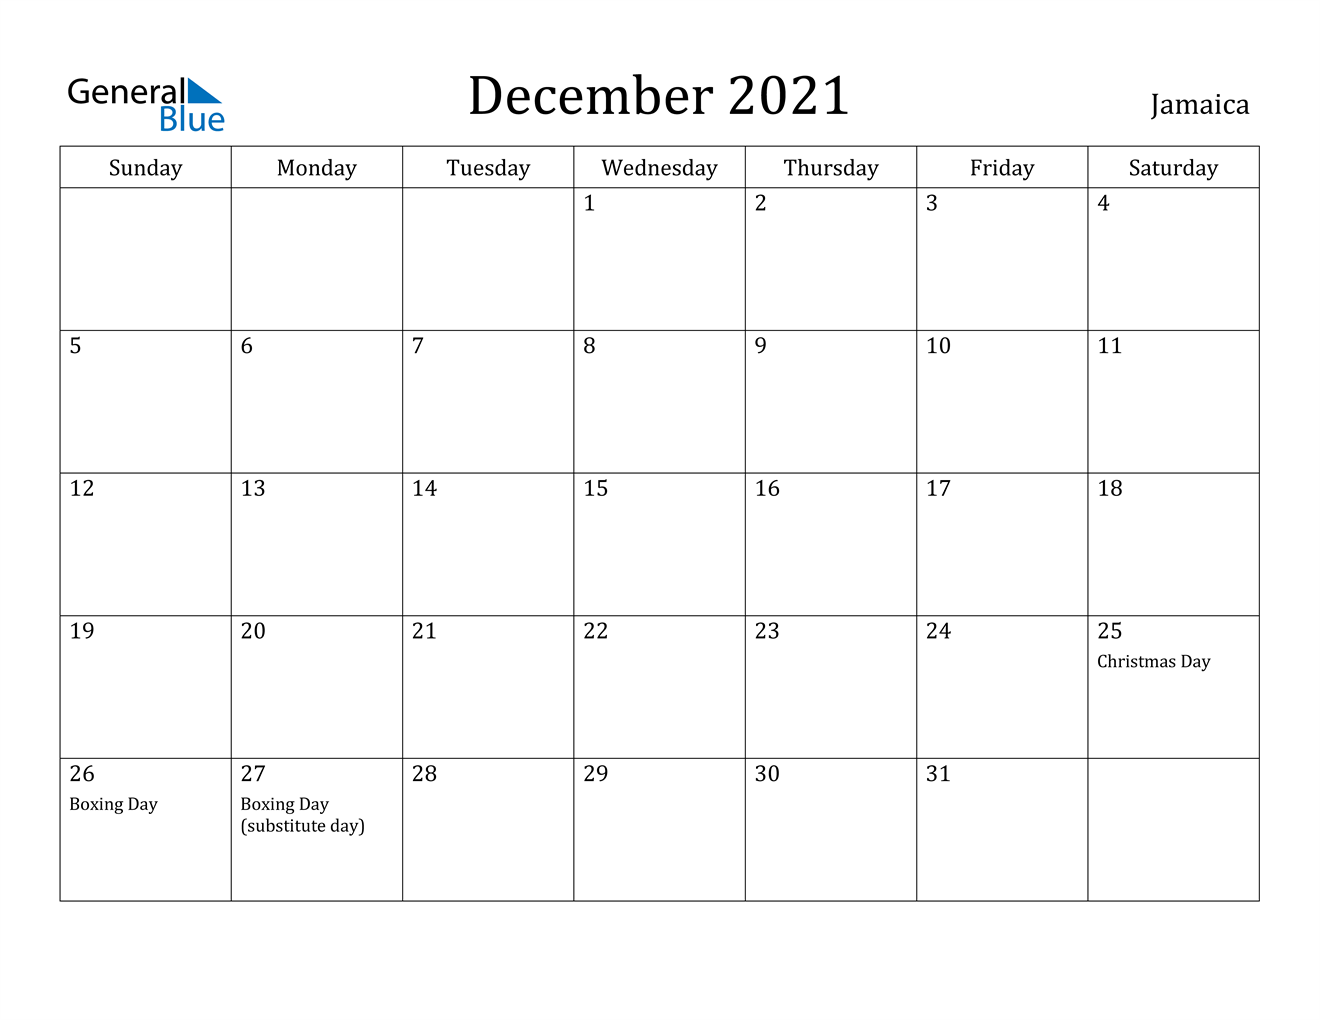 December 2021 Calendar - Jamaica